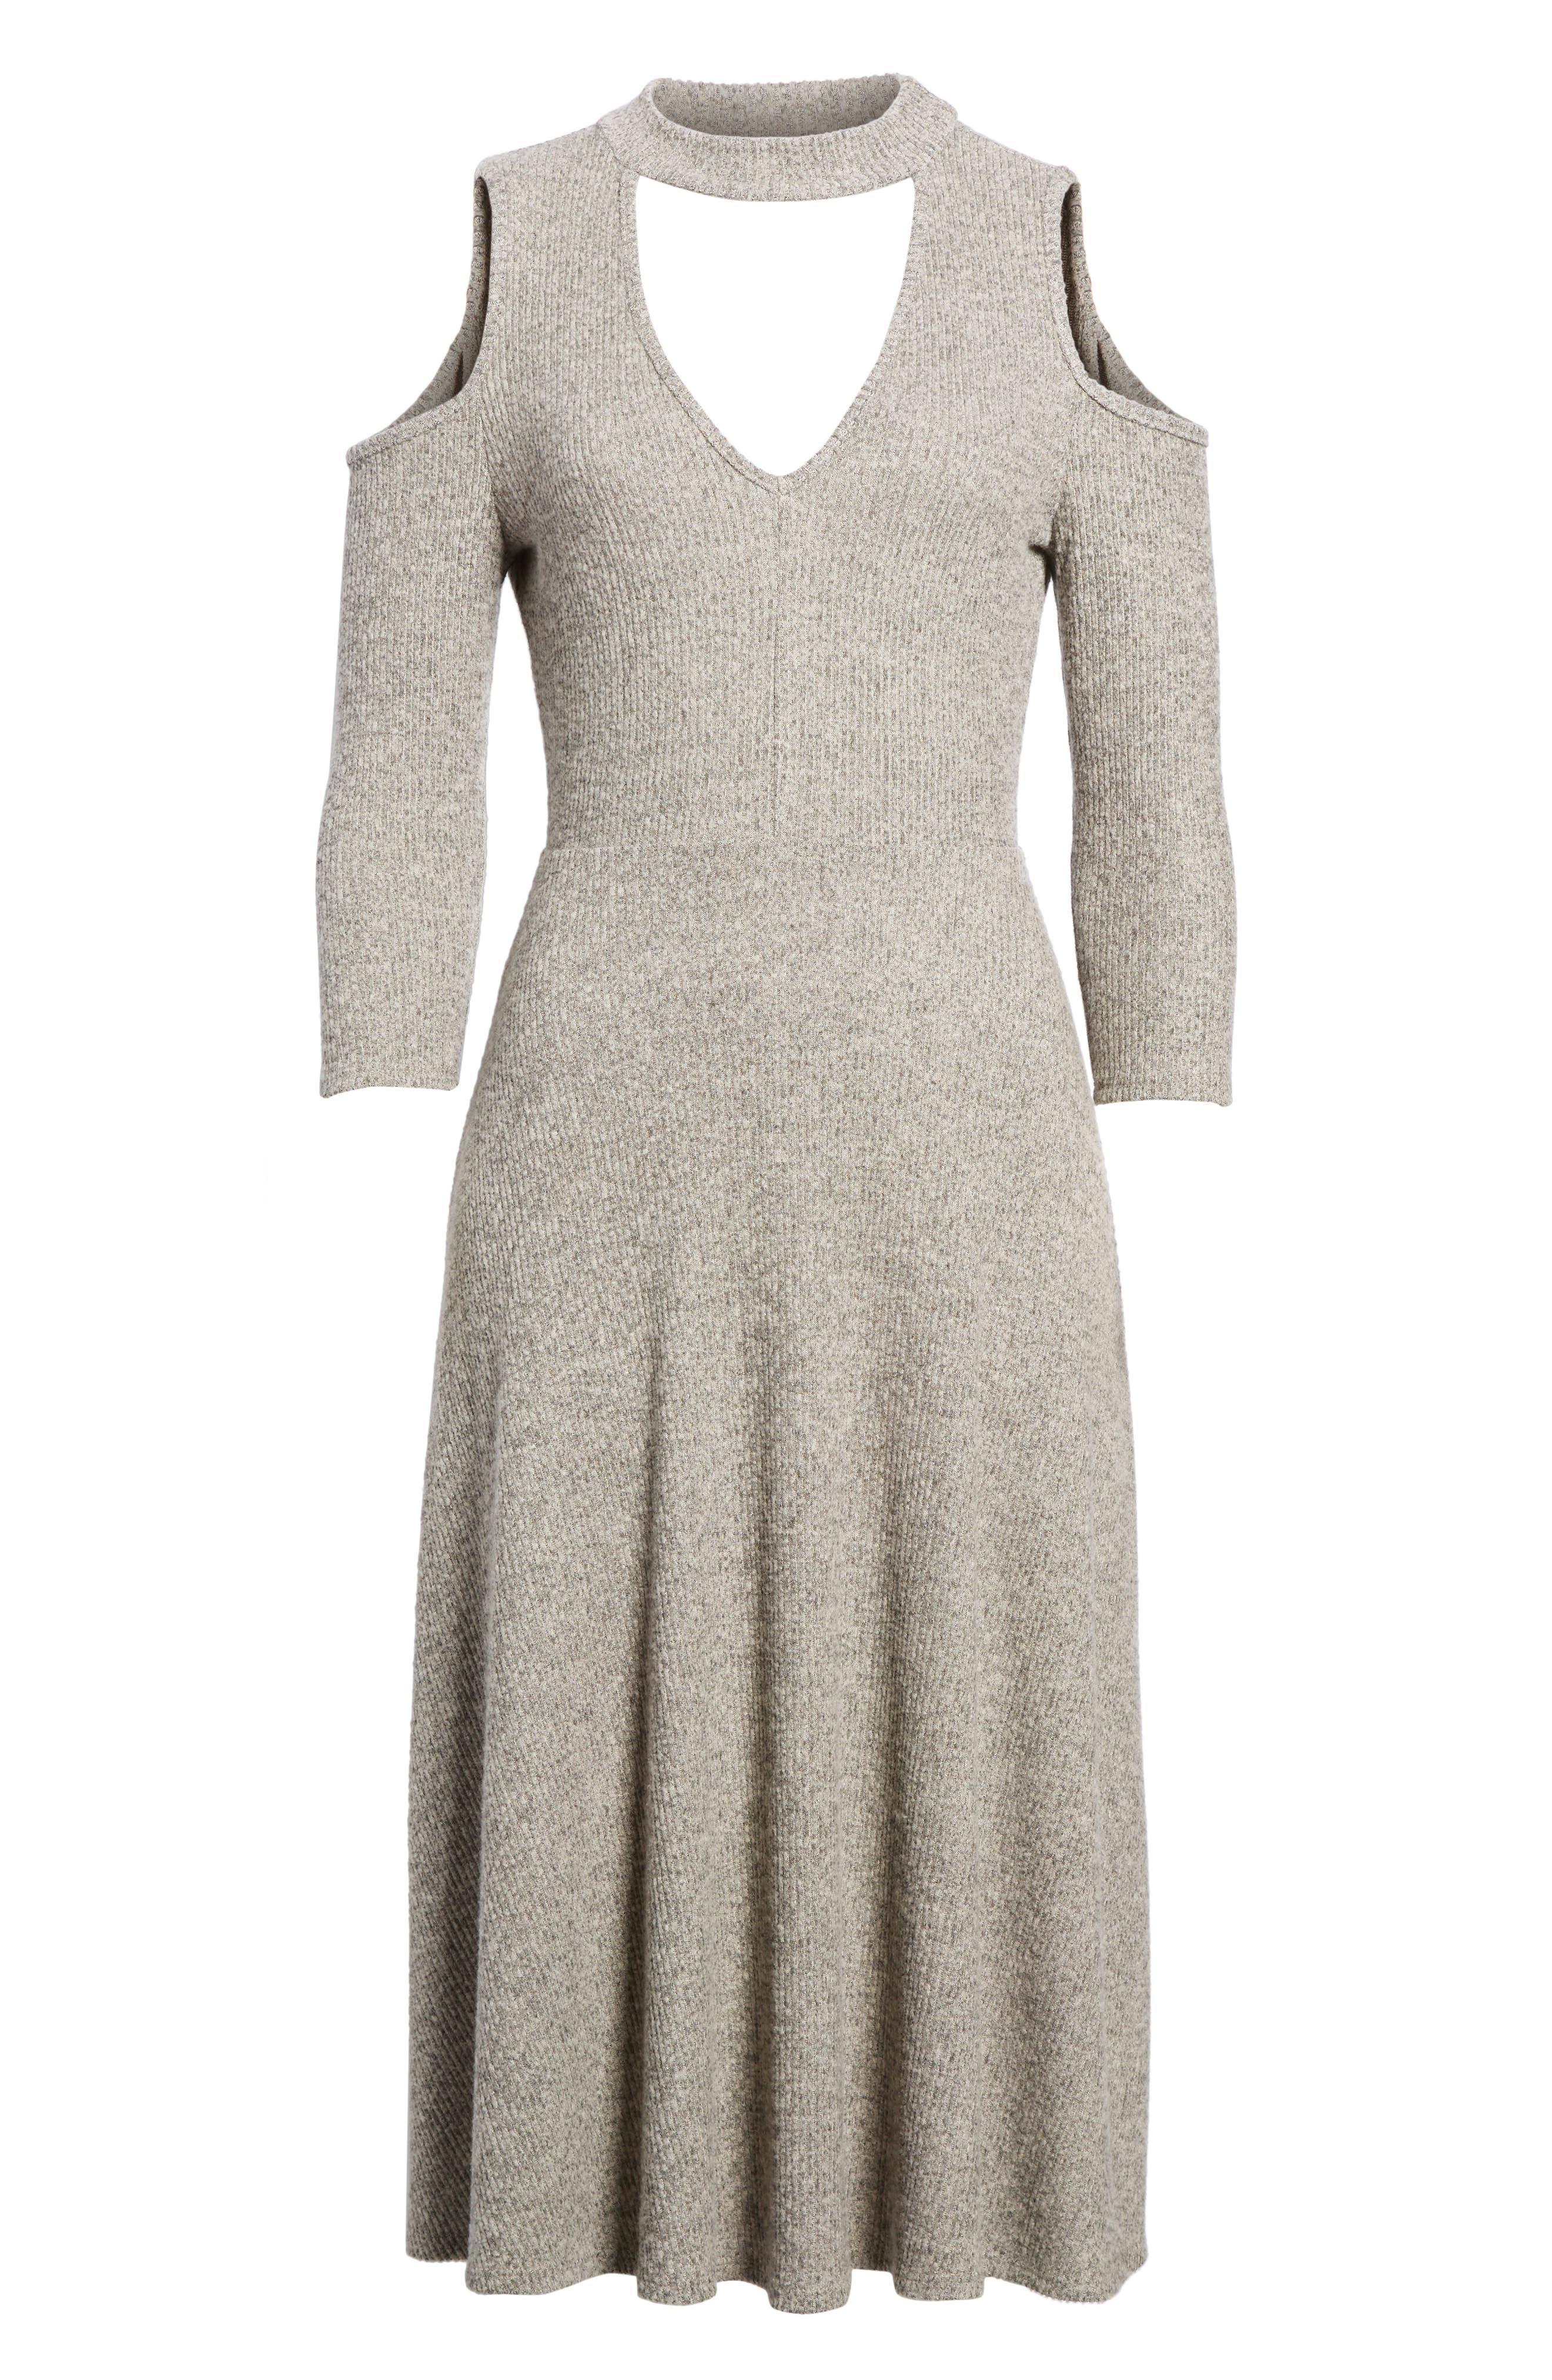 Choker Neck Cold Shoulder Midi Dress,                             Alternate thumbnail 6, color,